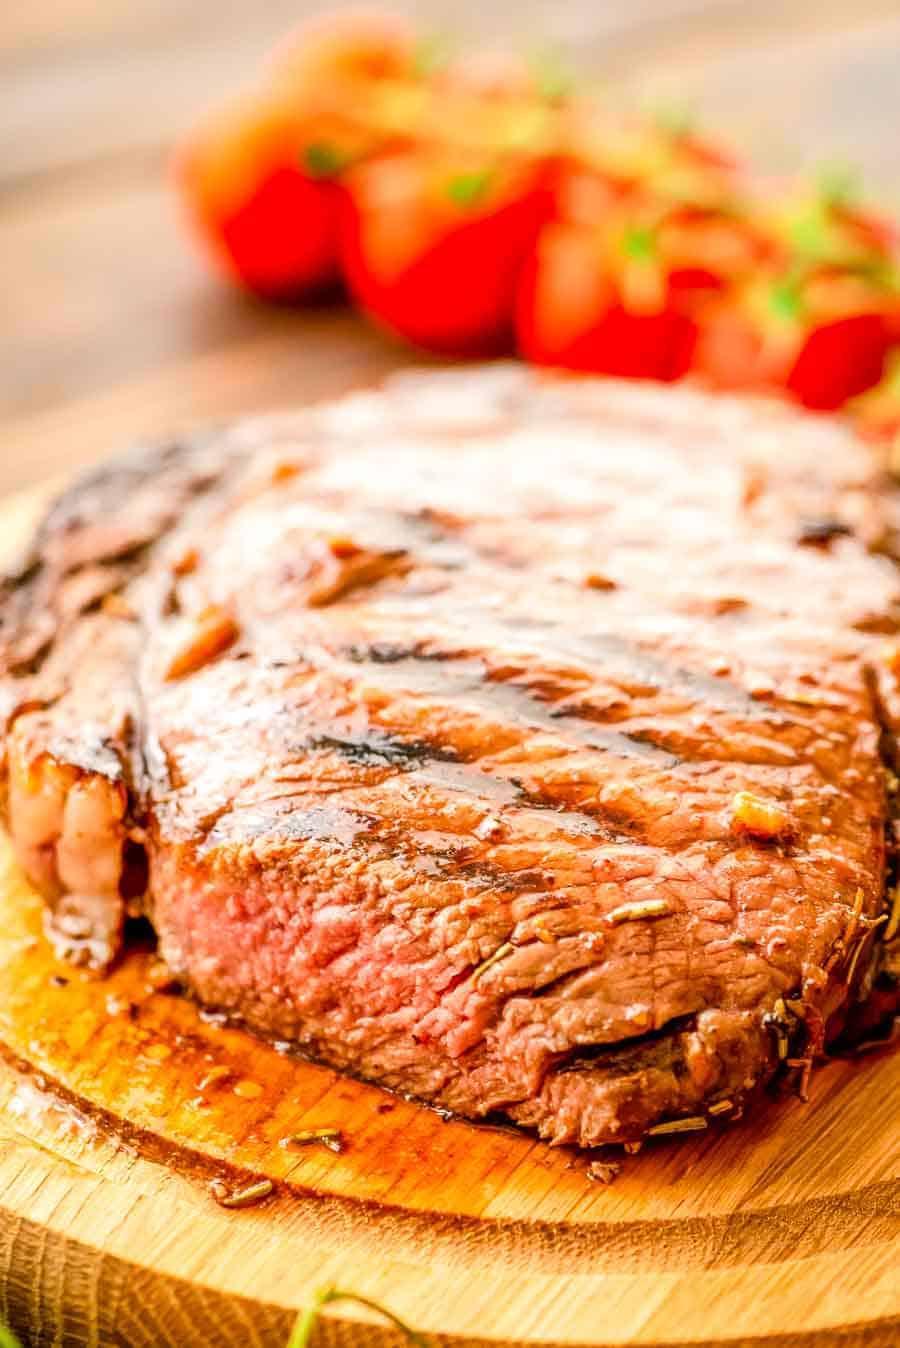 Balsamic steak on cutting board